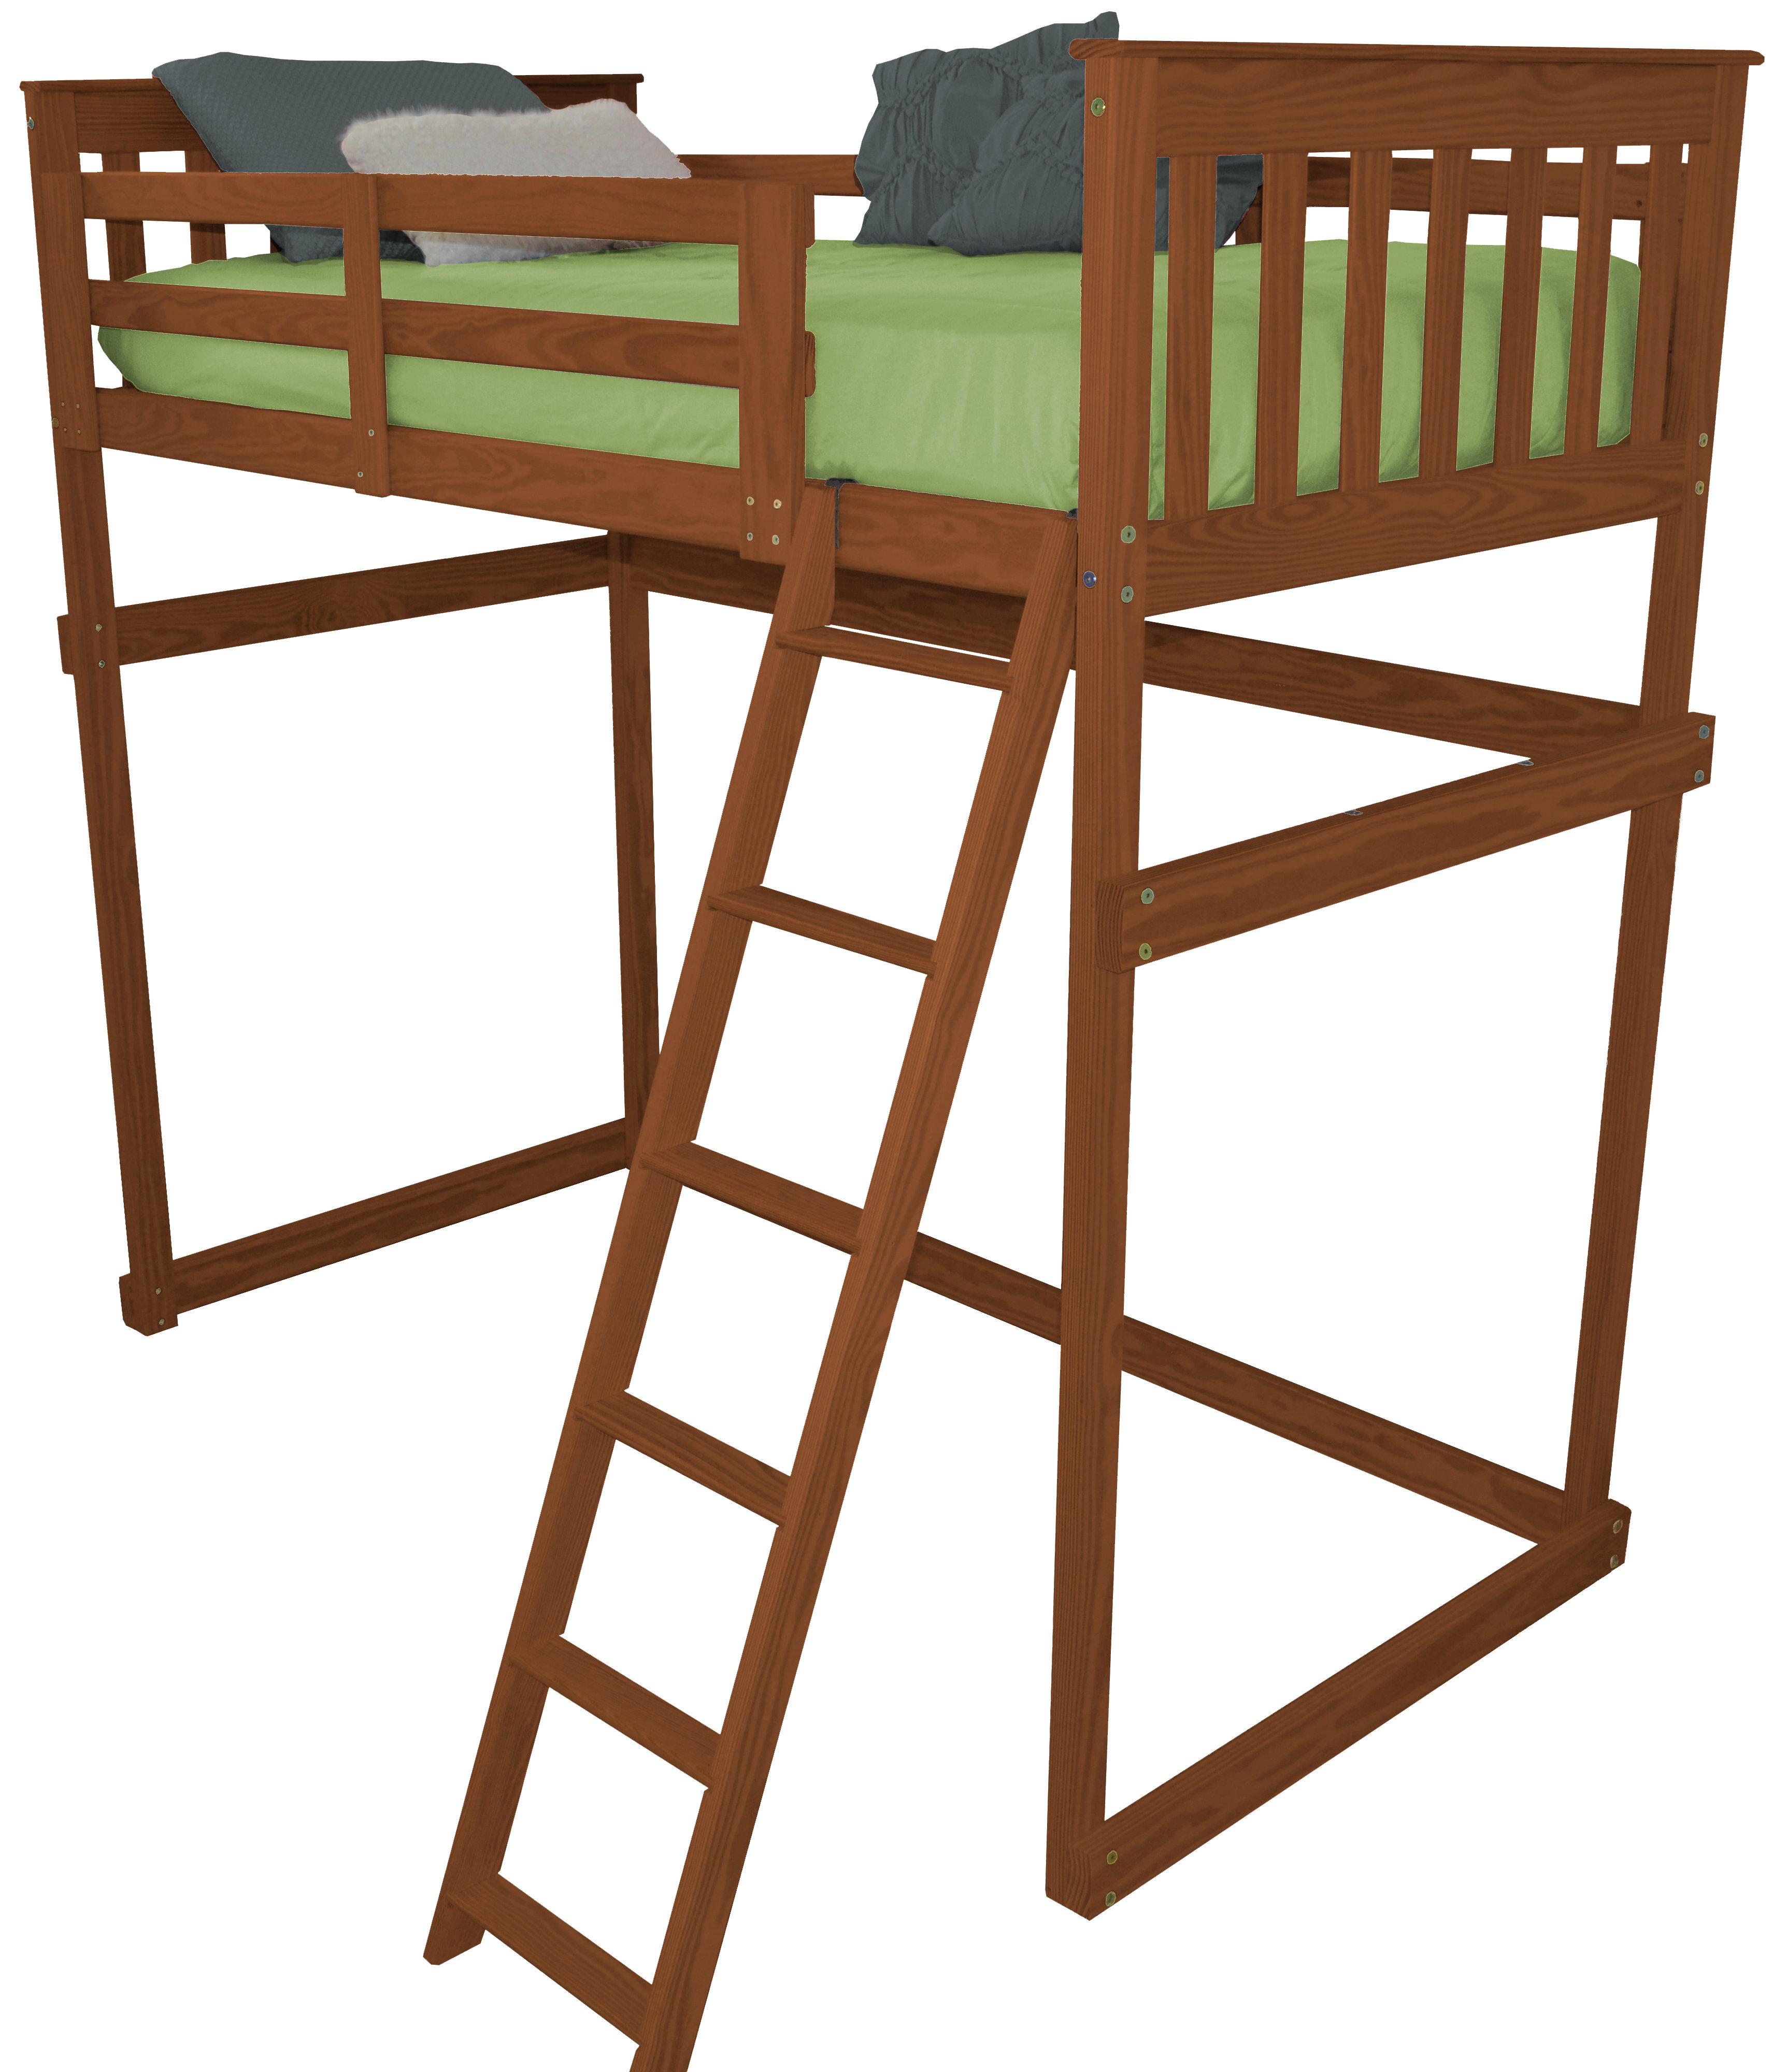 Zoomie Kids Swainsboro Loft Bed With Side Ladder Reviews Wayfair